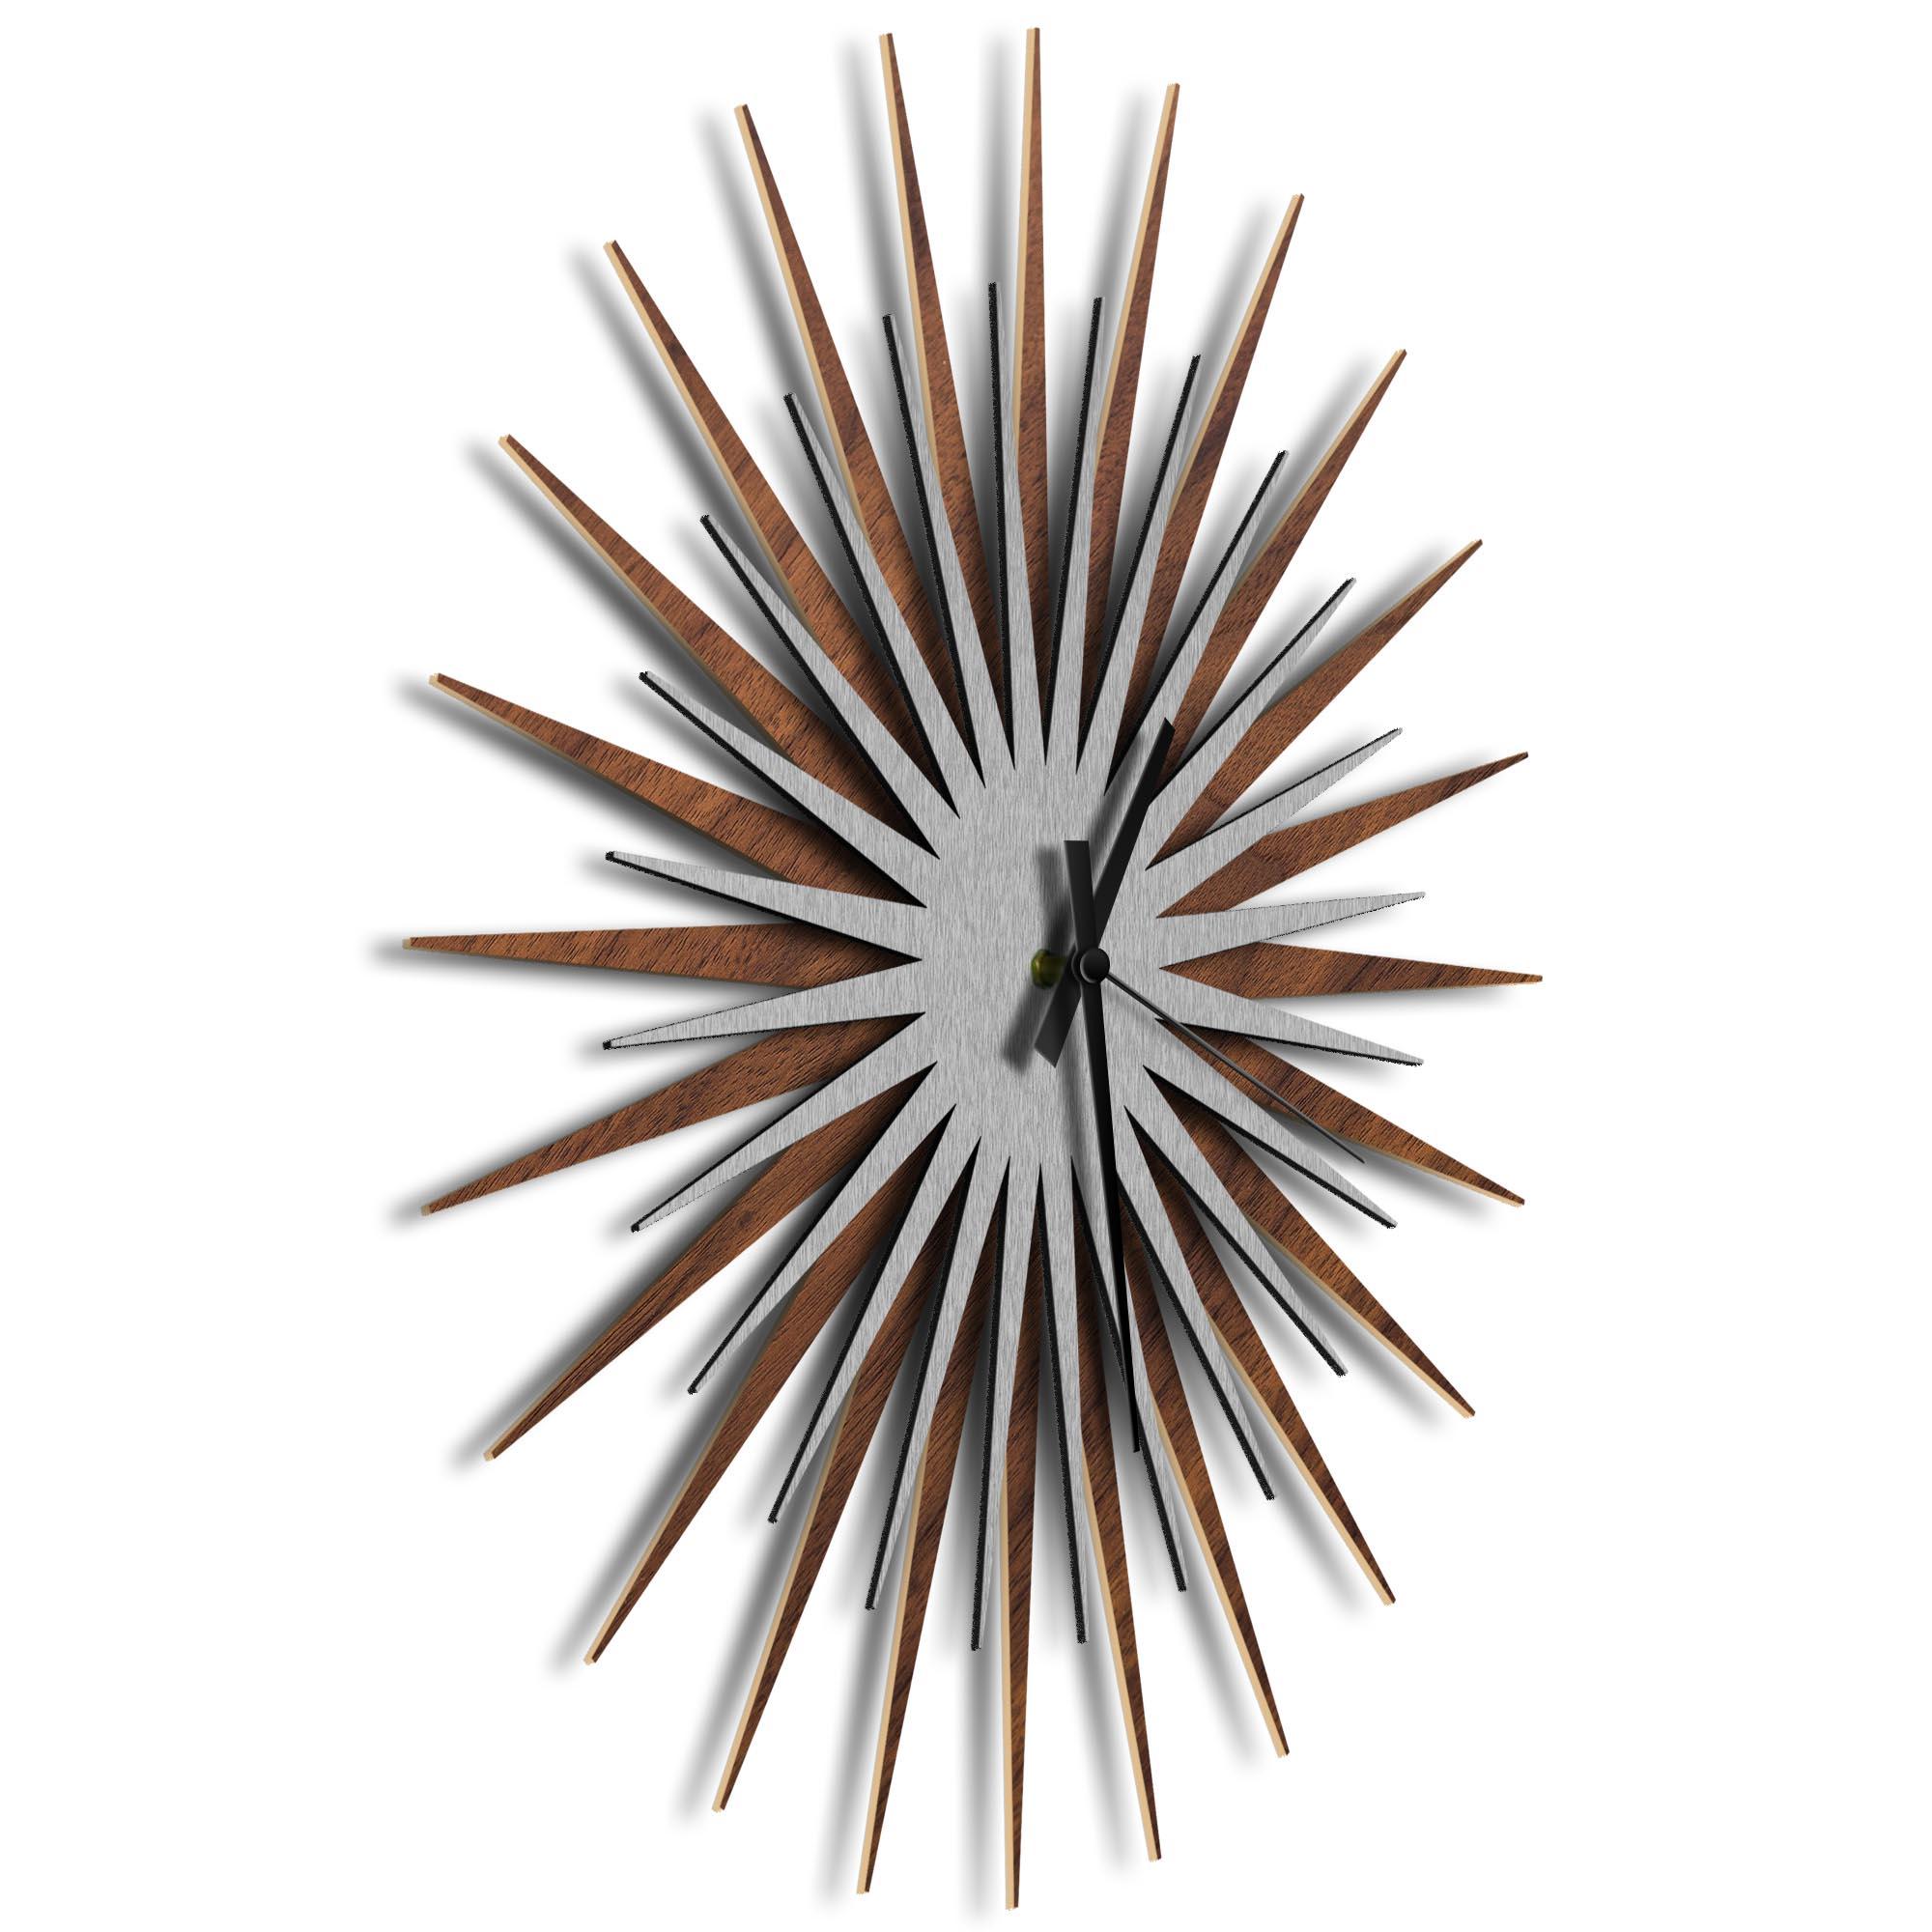 Atomic Era Clock Walnut Silver Black by Adam Schwoeppe - Mid-Century Modern Clock on Brushed Walnut Polymetal - Image 2